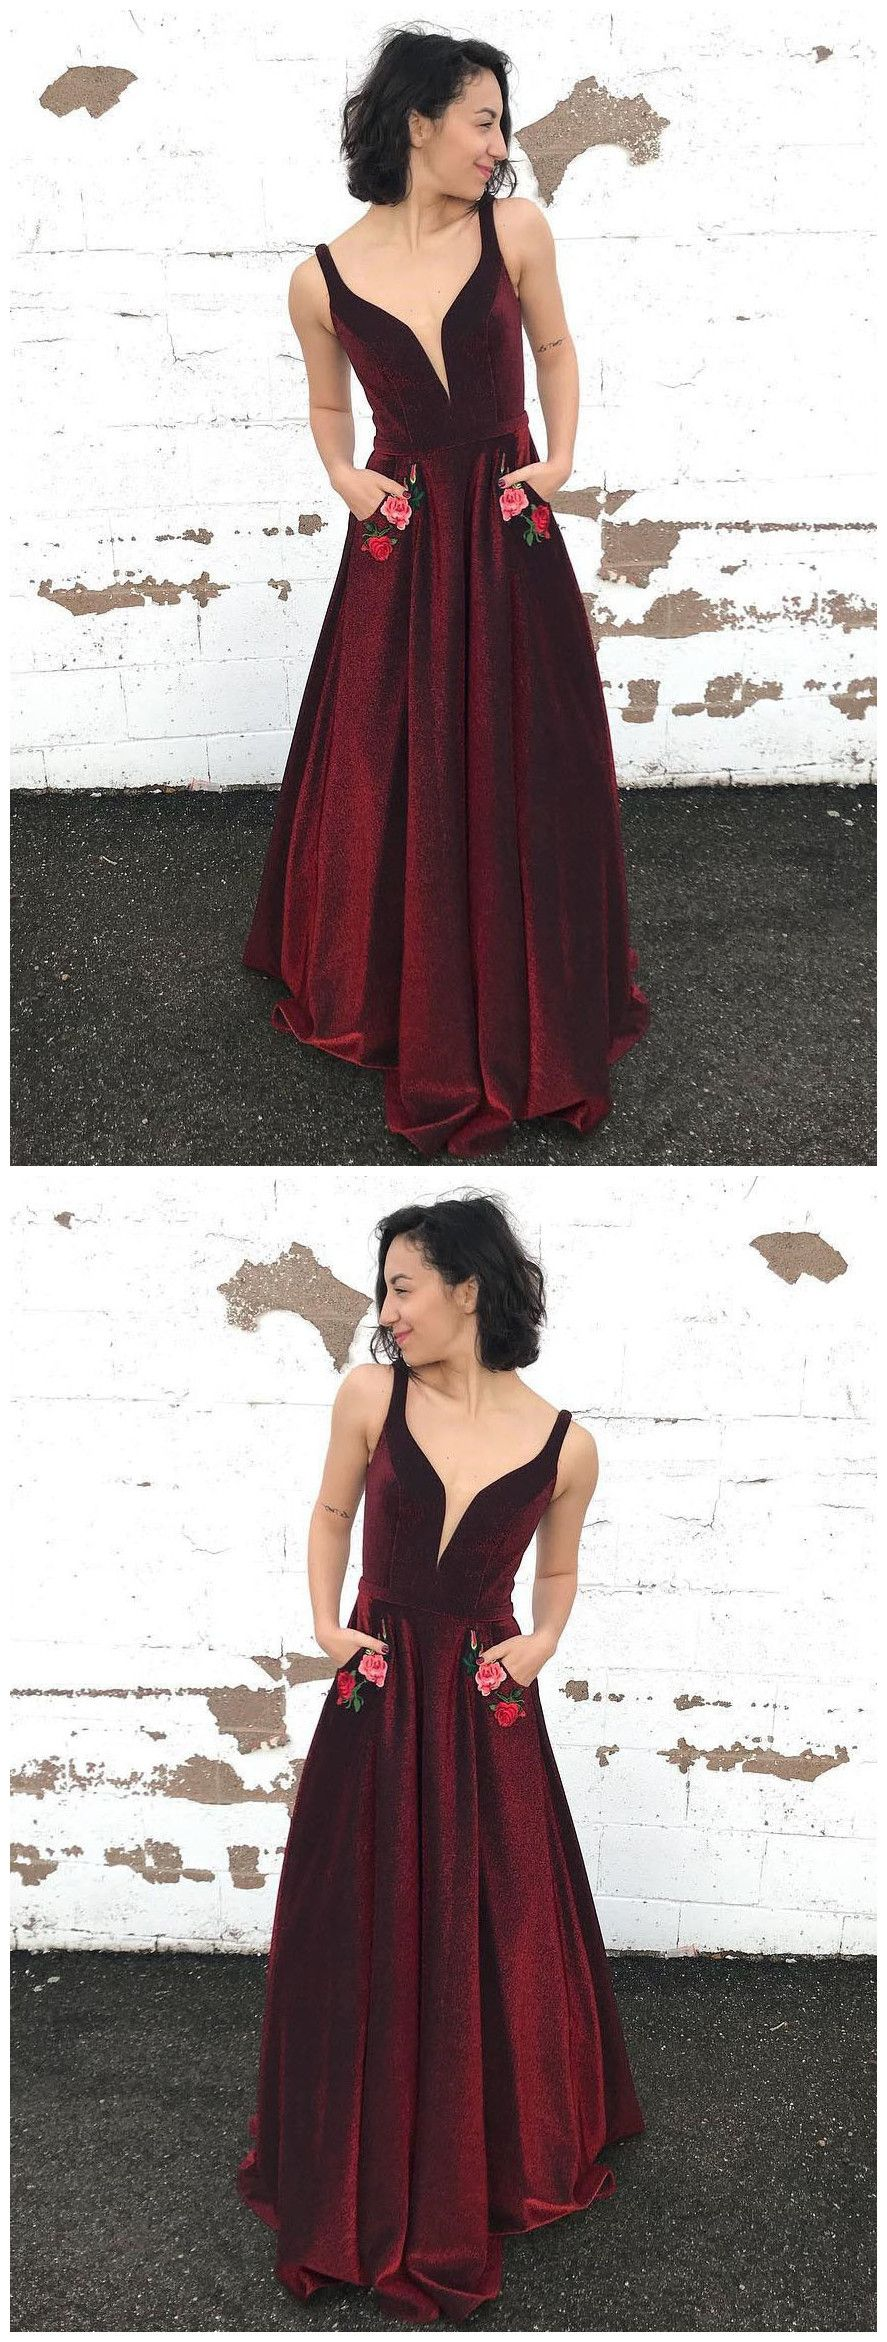 long prom dress burgundy straps floral graduacion long prom